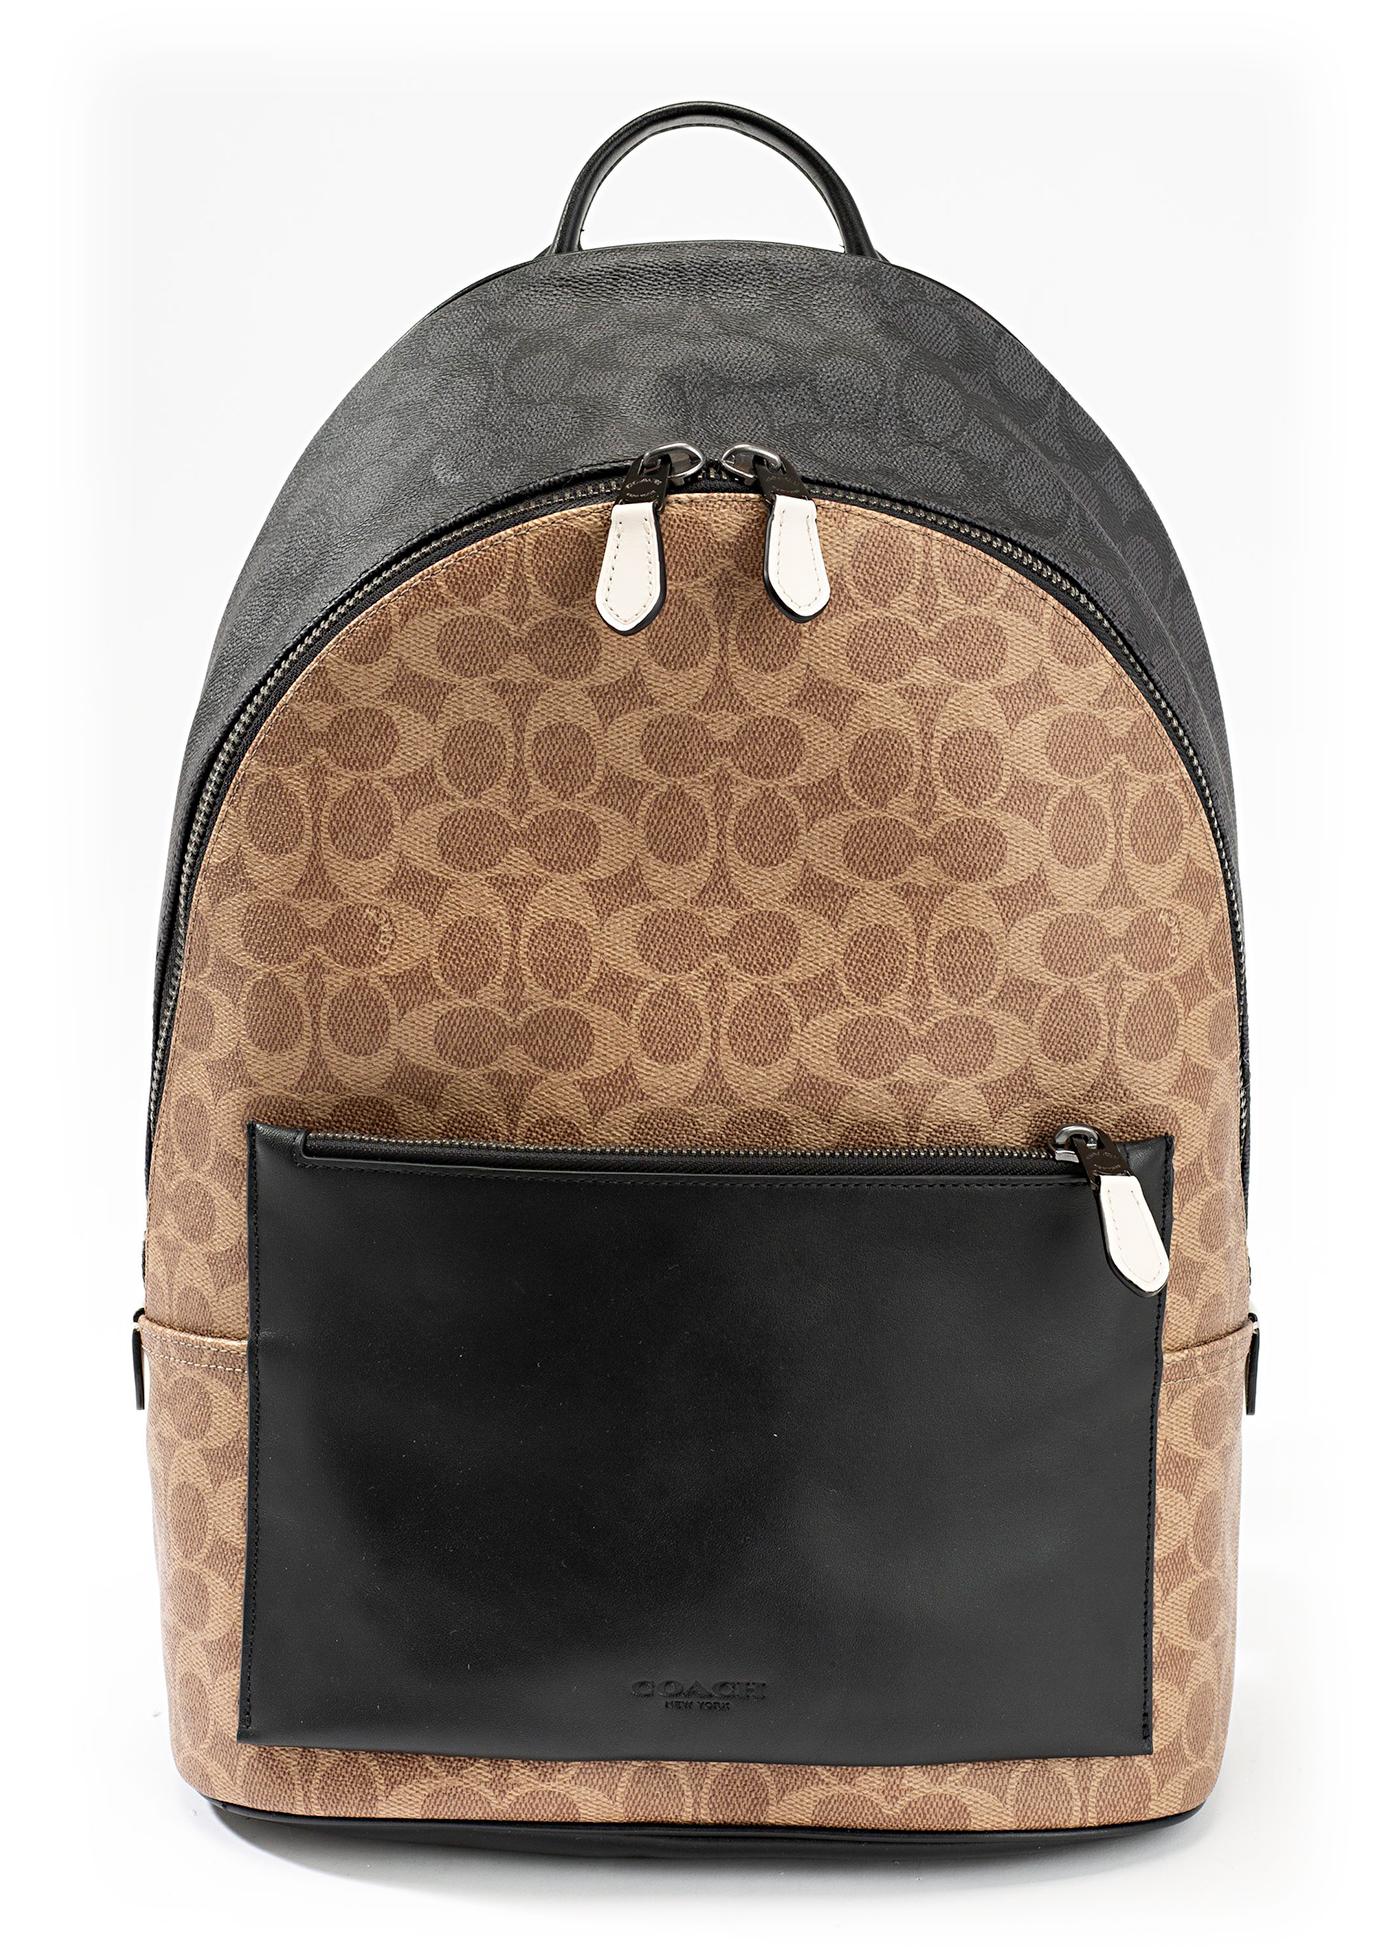 METRO Backpack image number 0